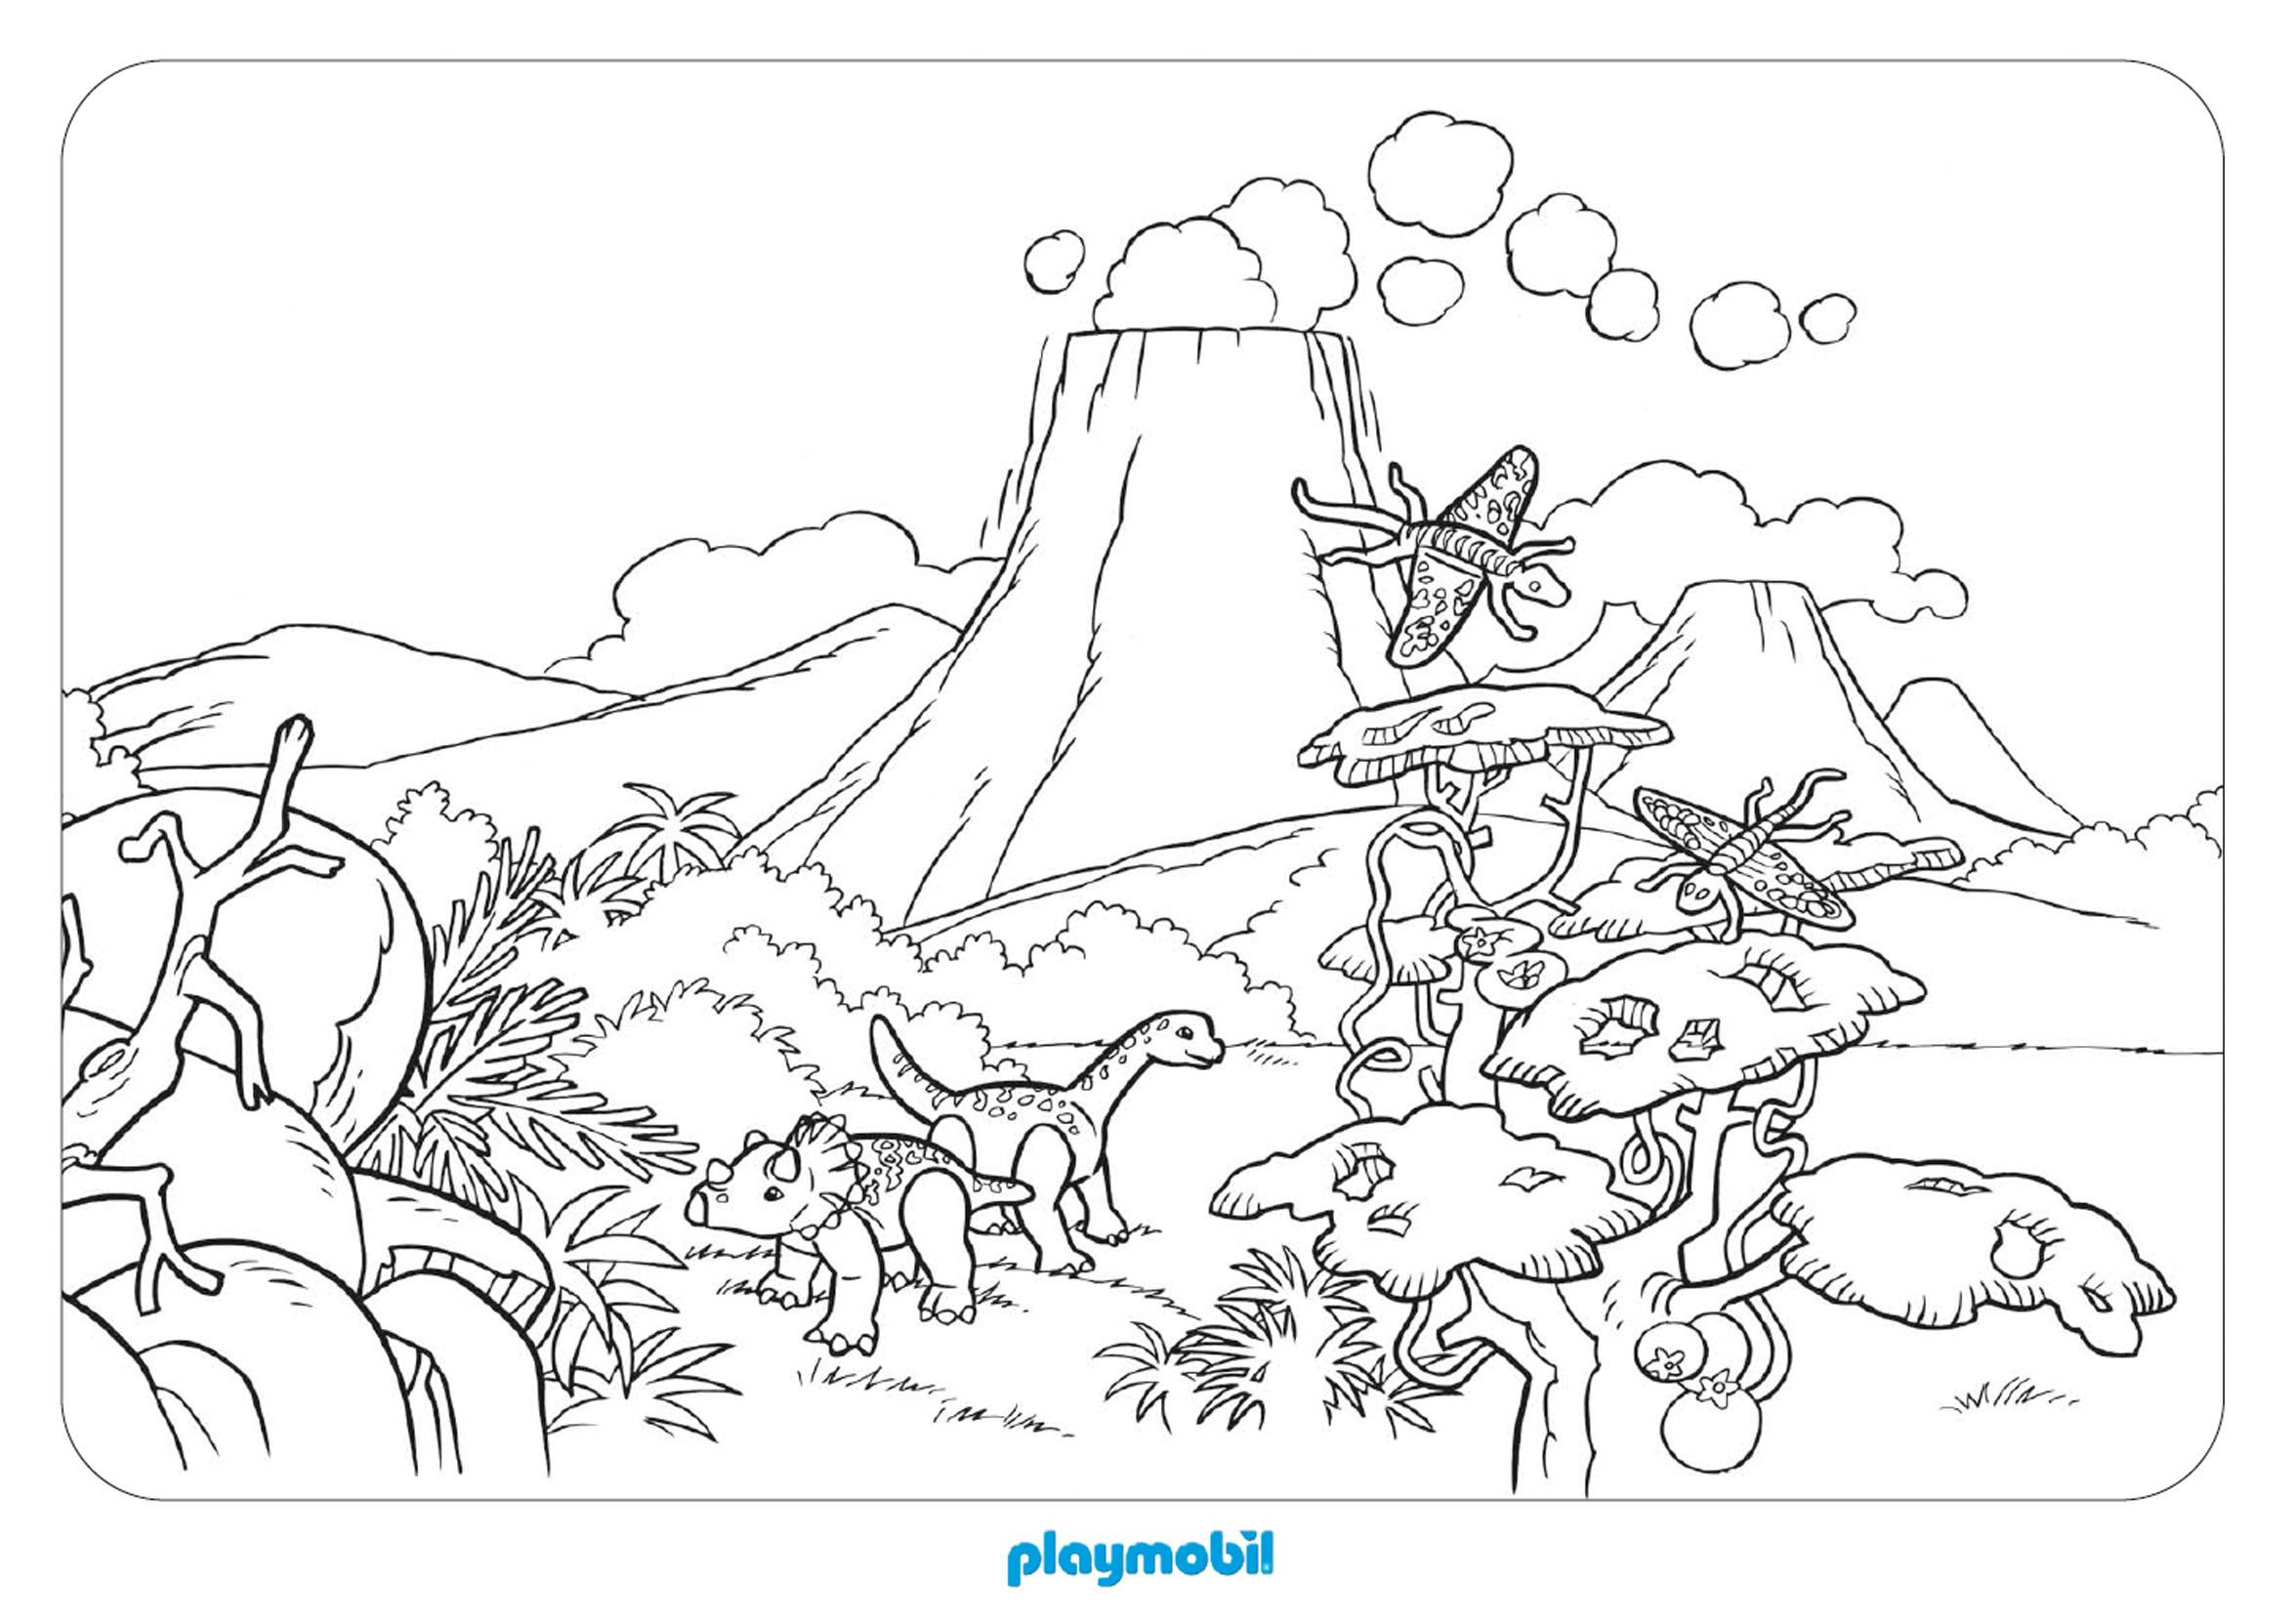 Coloriage dessiner imprimer dinosaure gratuit - Coloriage de dinosaures ...